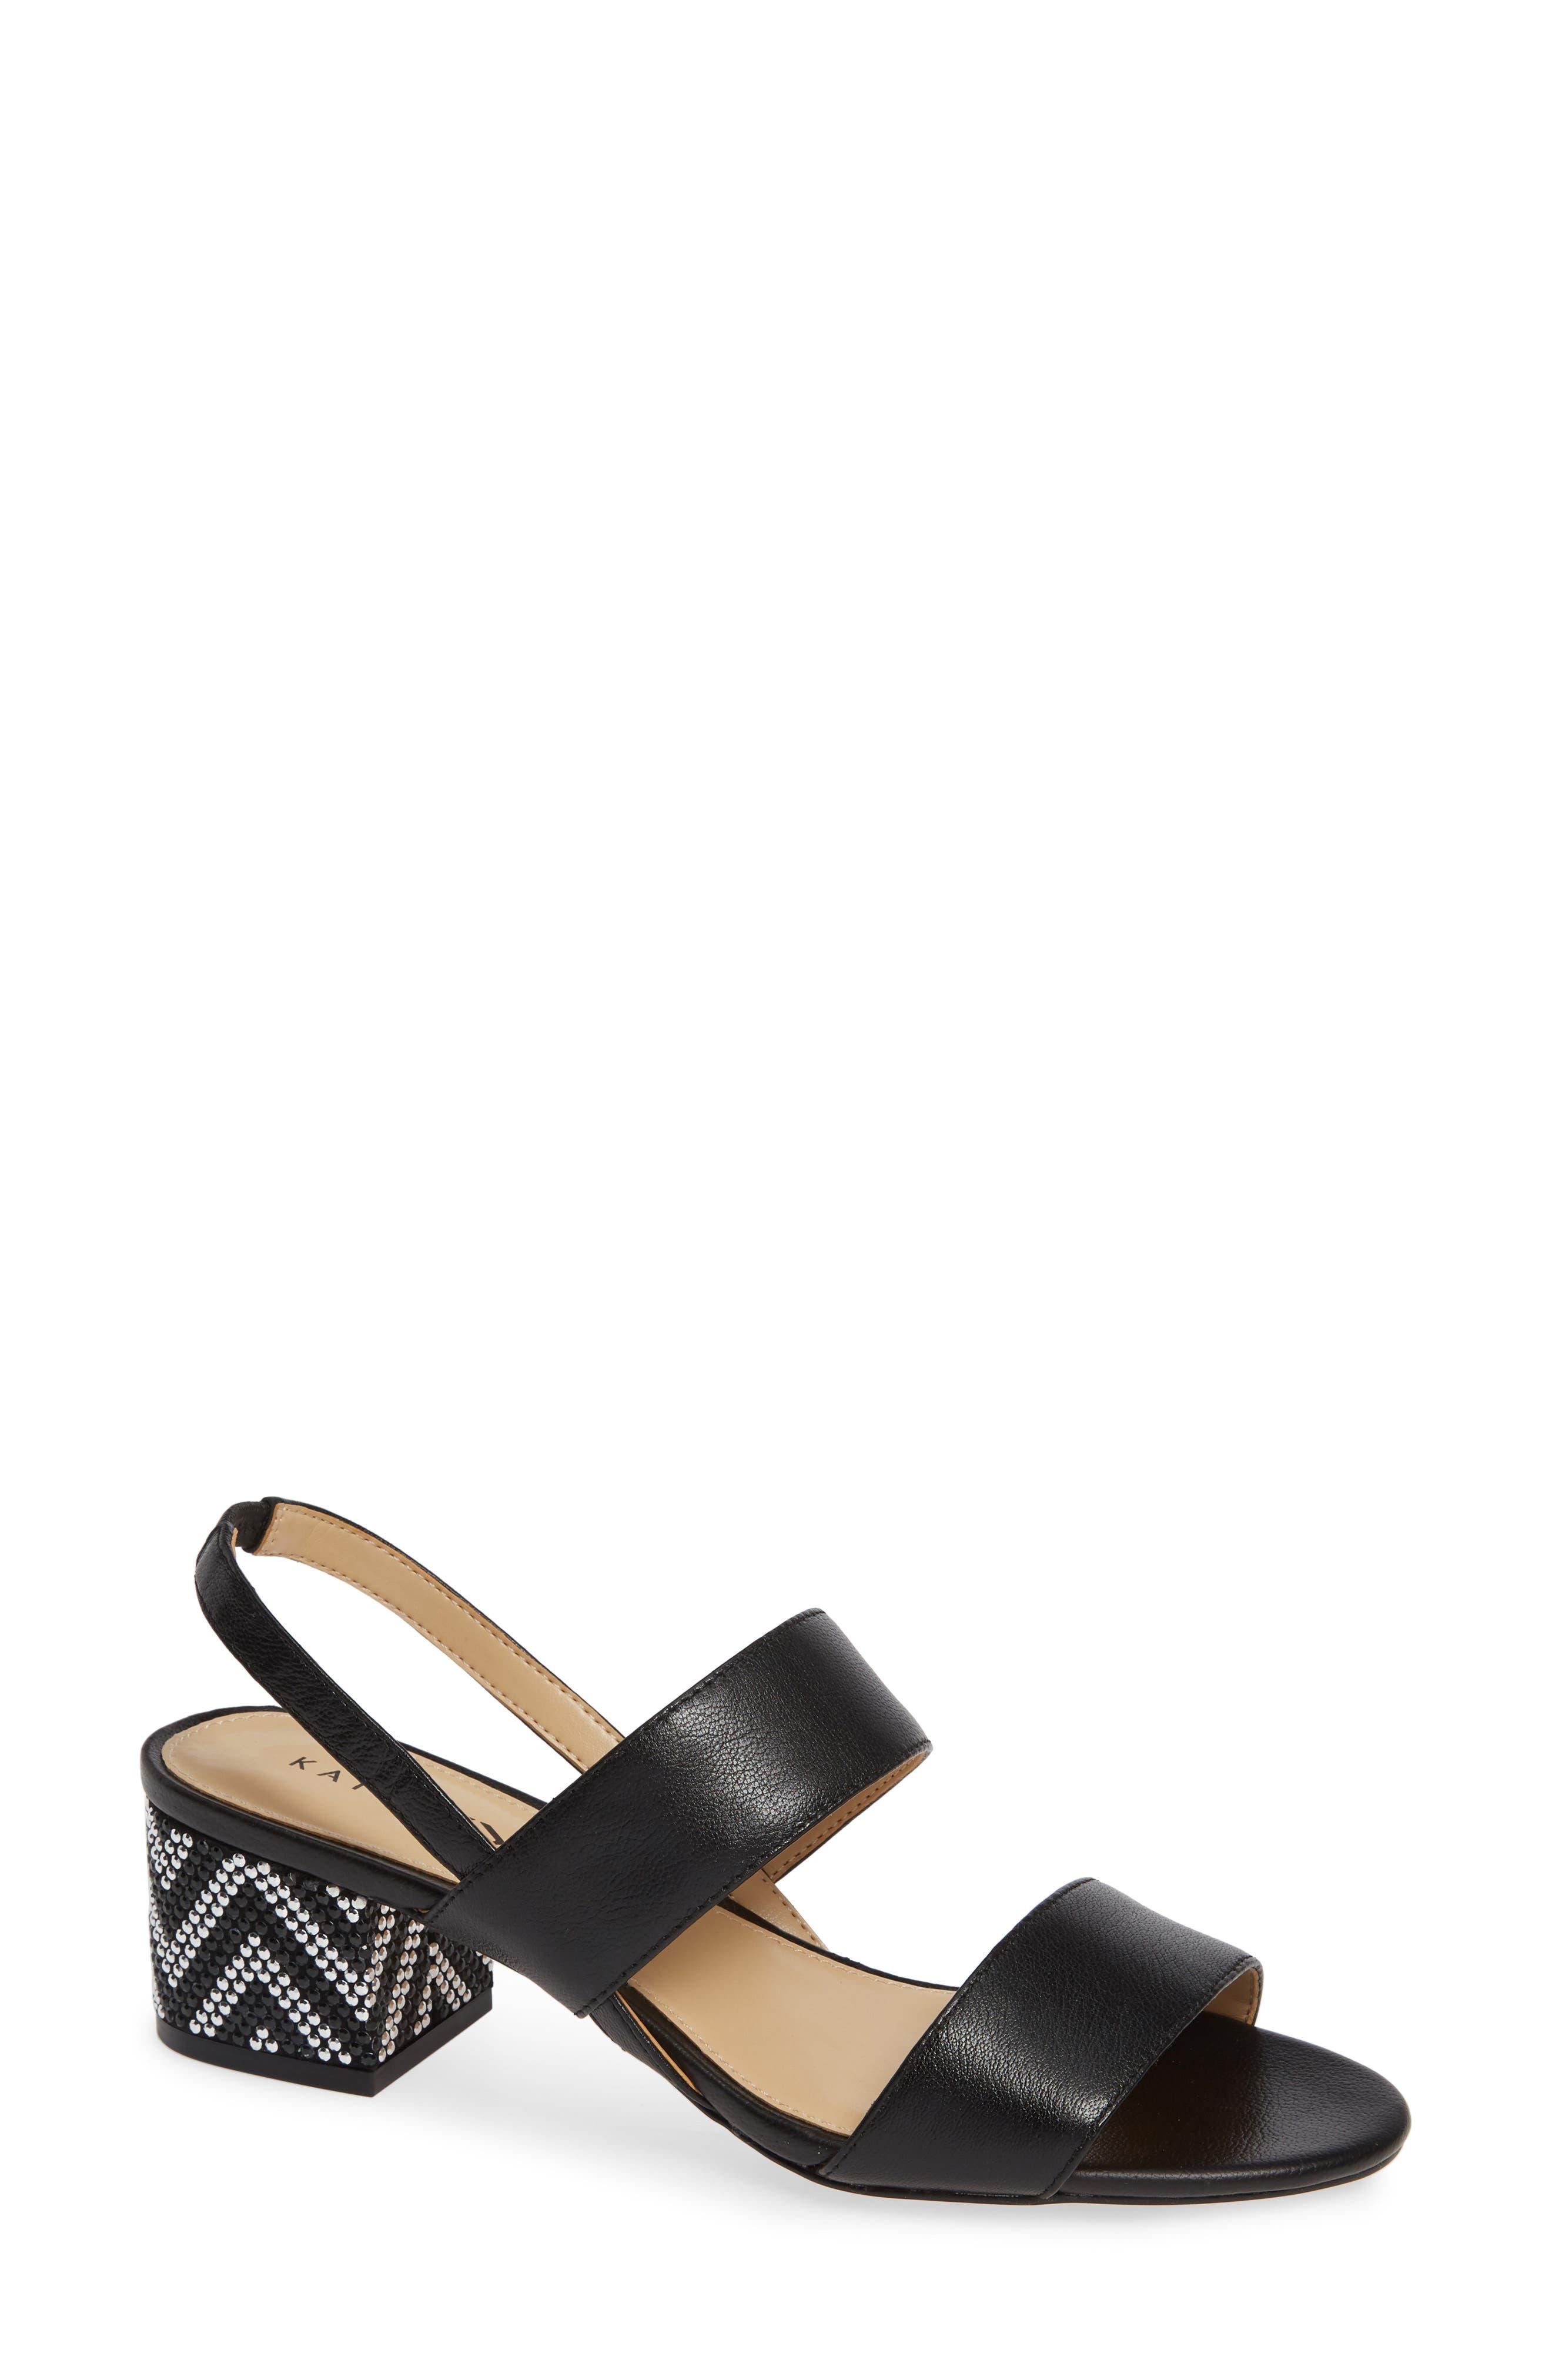 women's katy perry annalie sandal